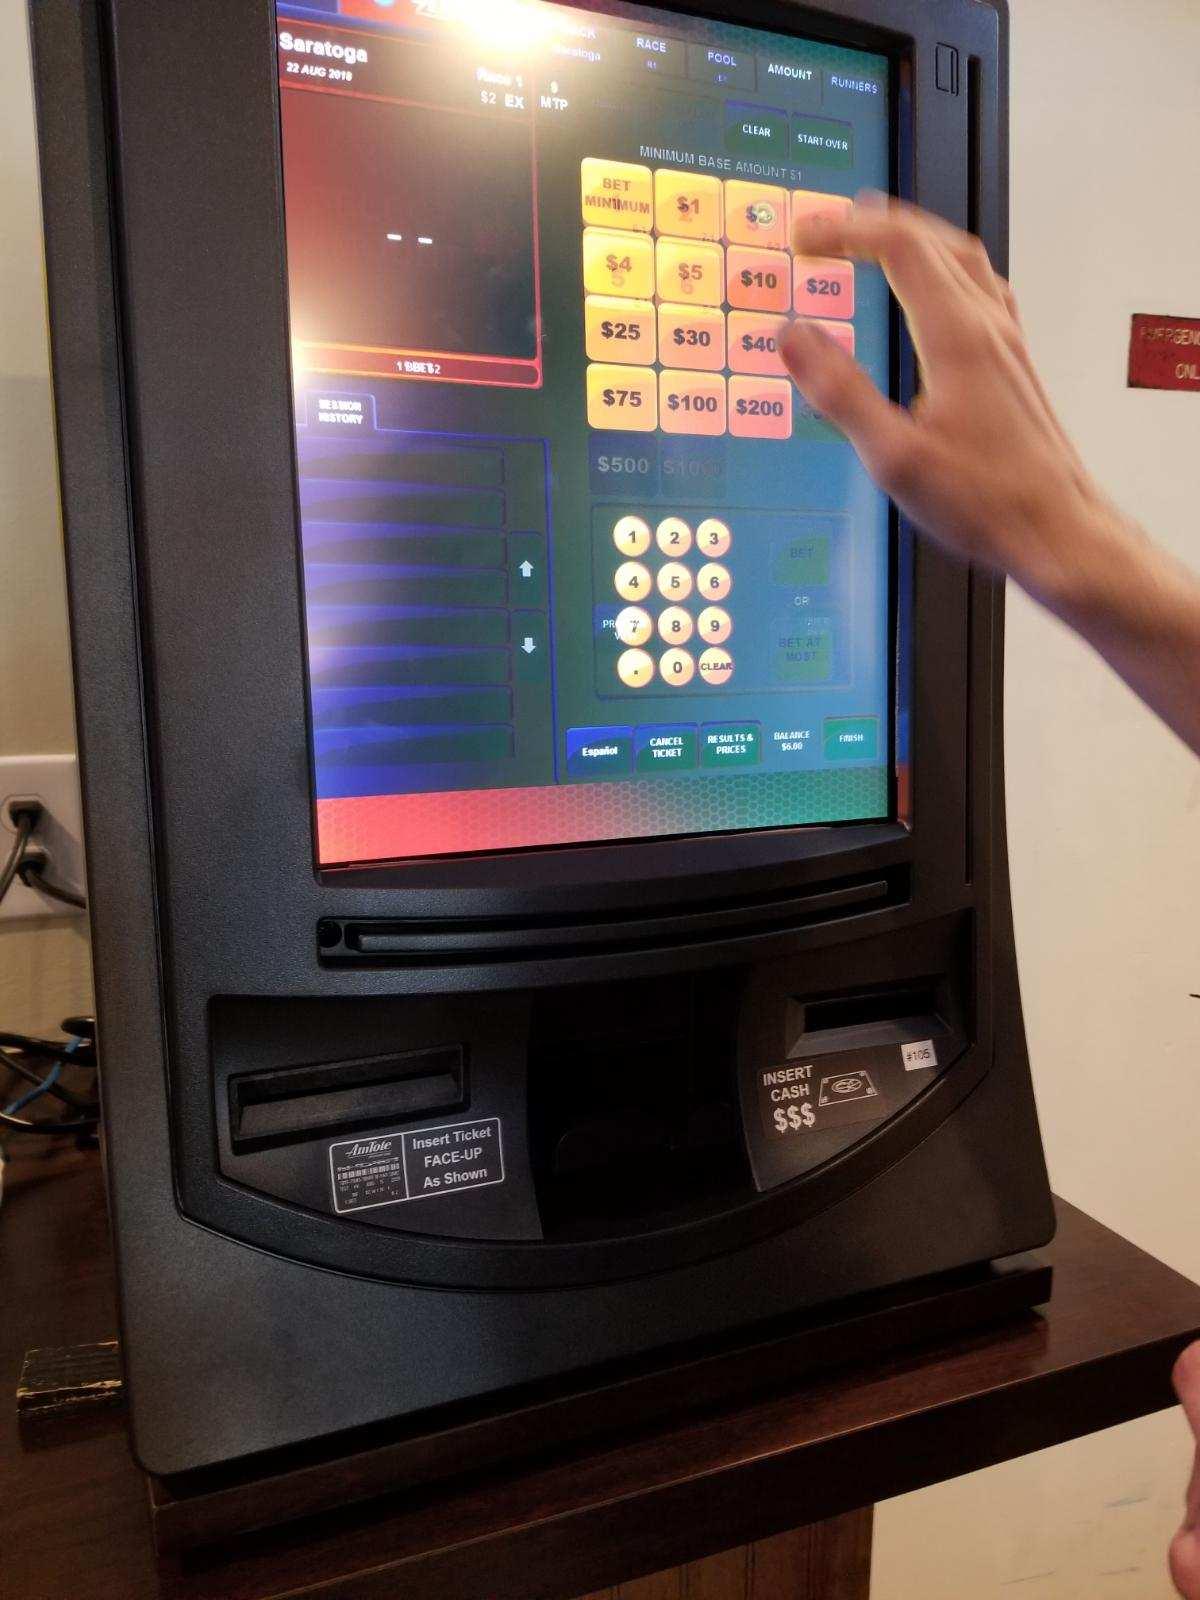 Off track betting in virginia bitcoins mining windows media